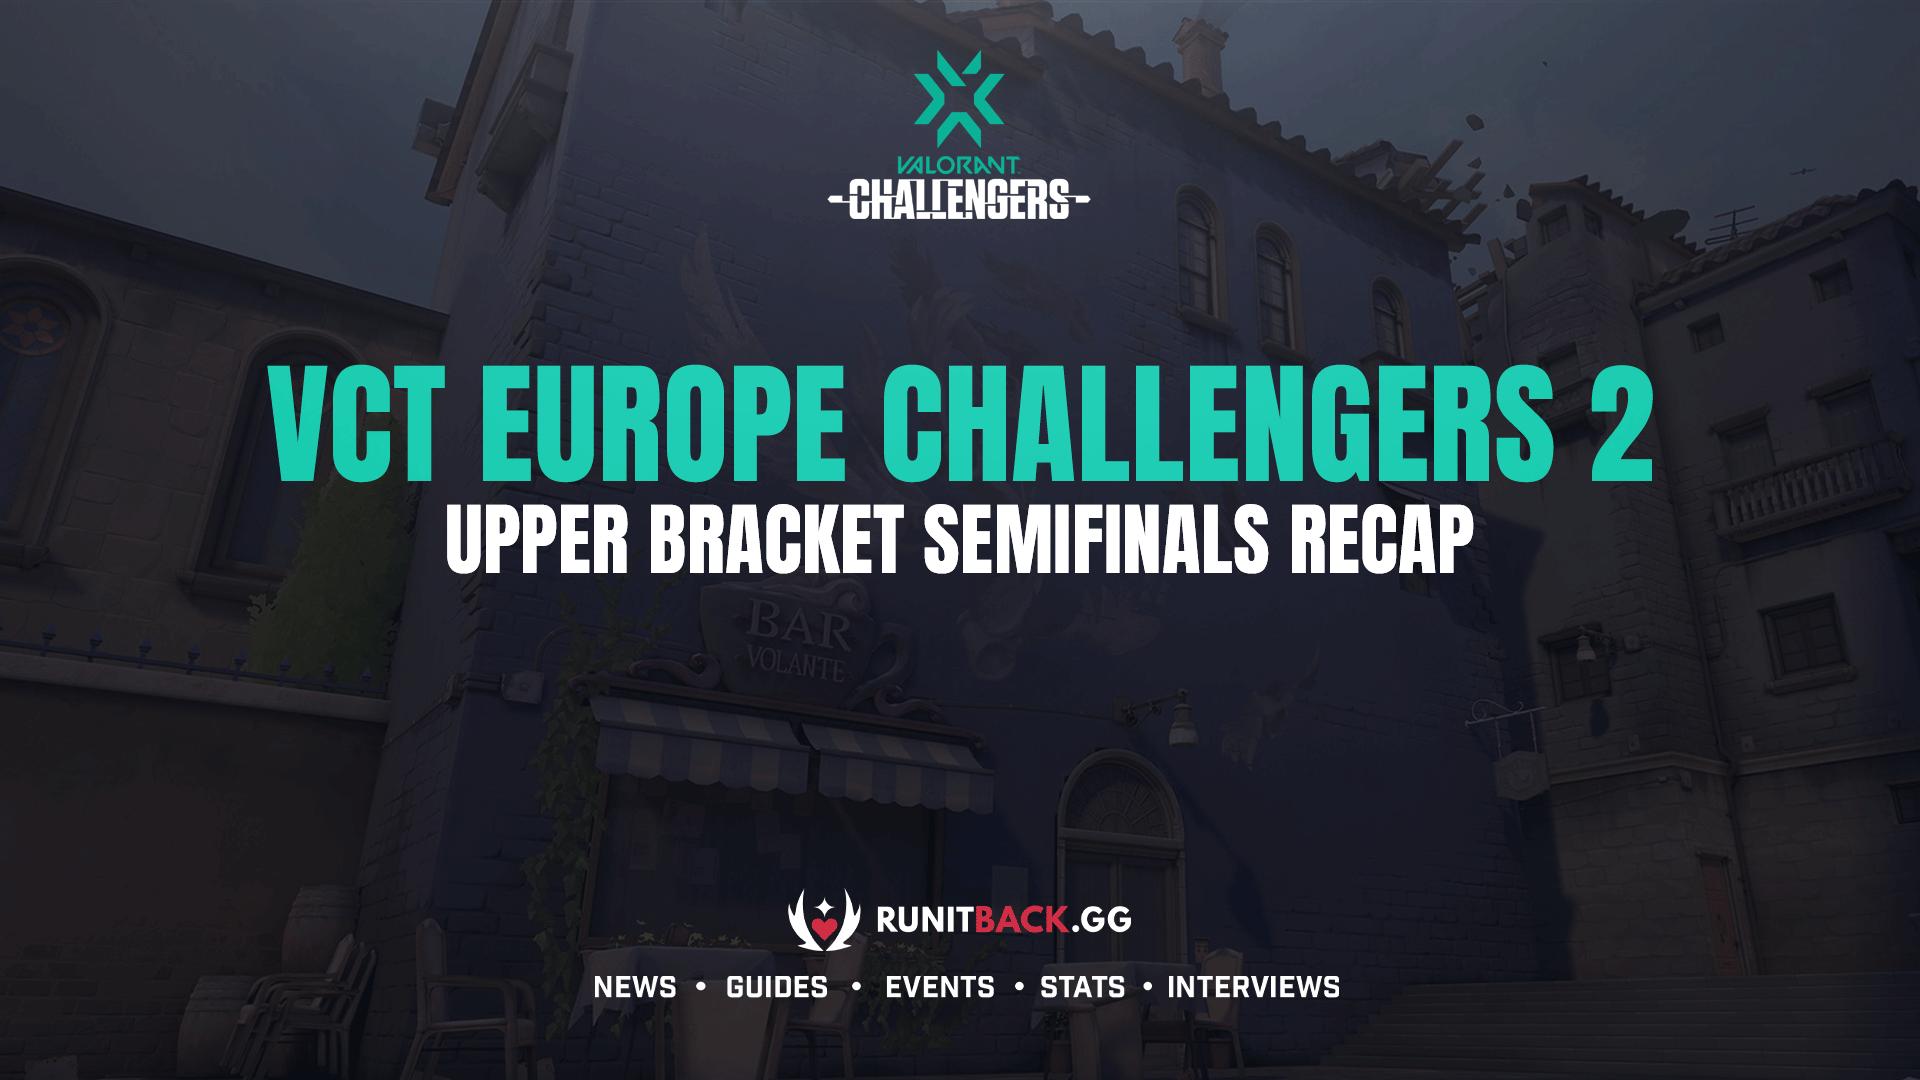 VCT EU Challengers 2 Upper Bracket semifinals: Giants stun Fnatic, Liquid deals with TENSTAR